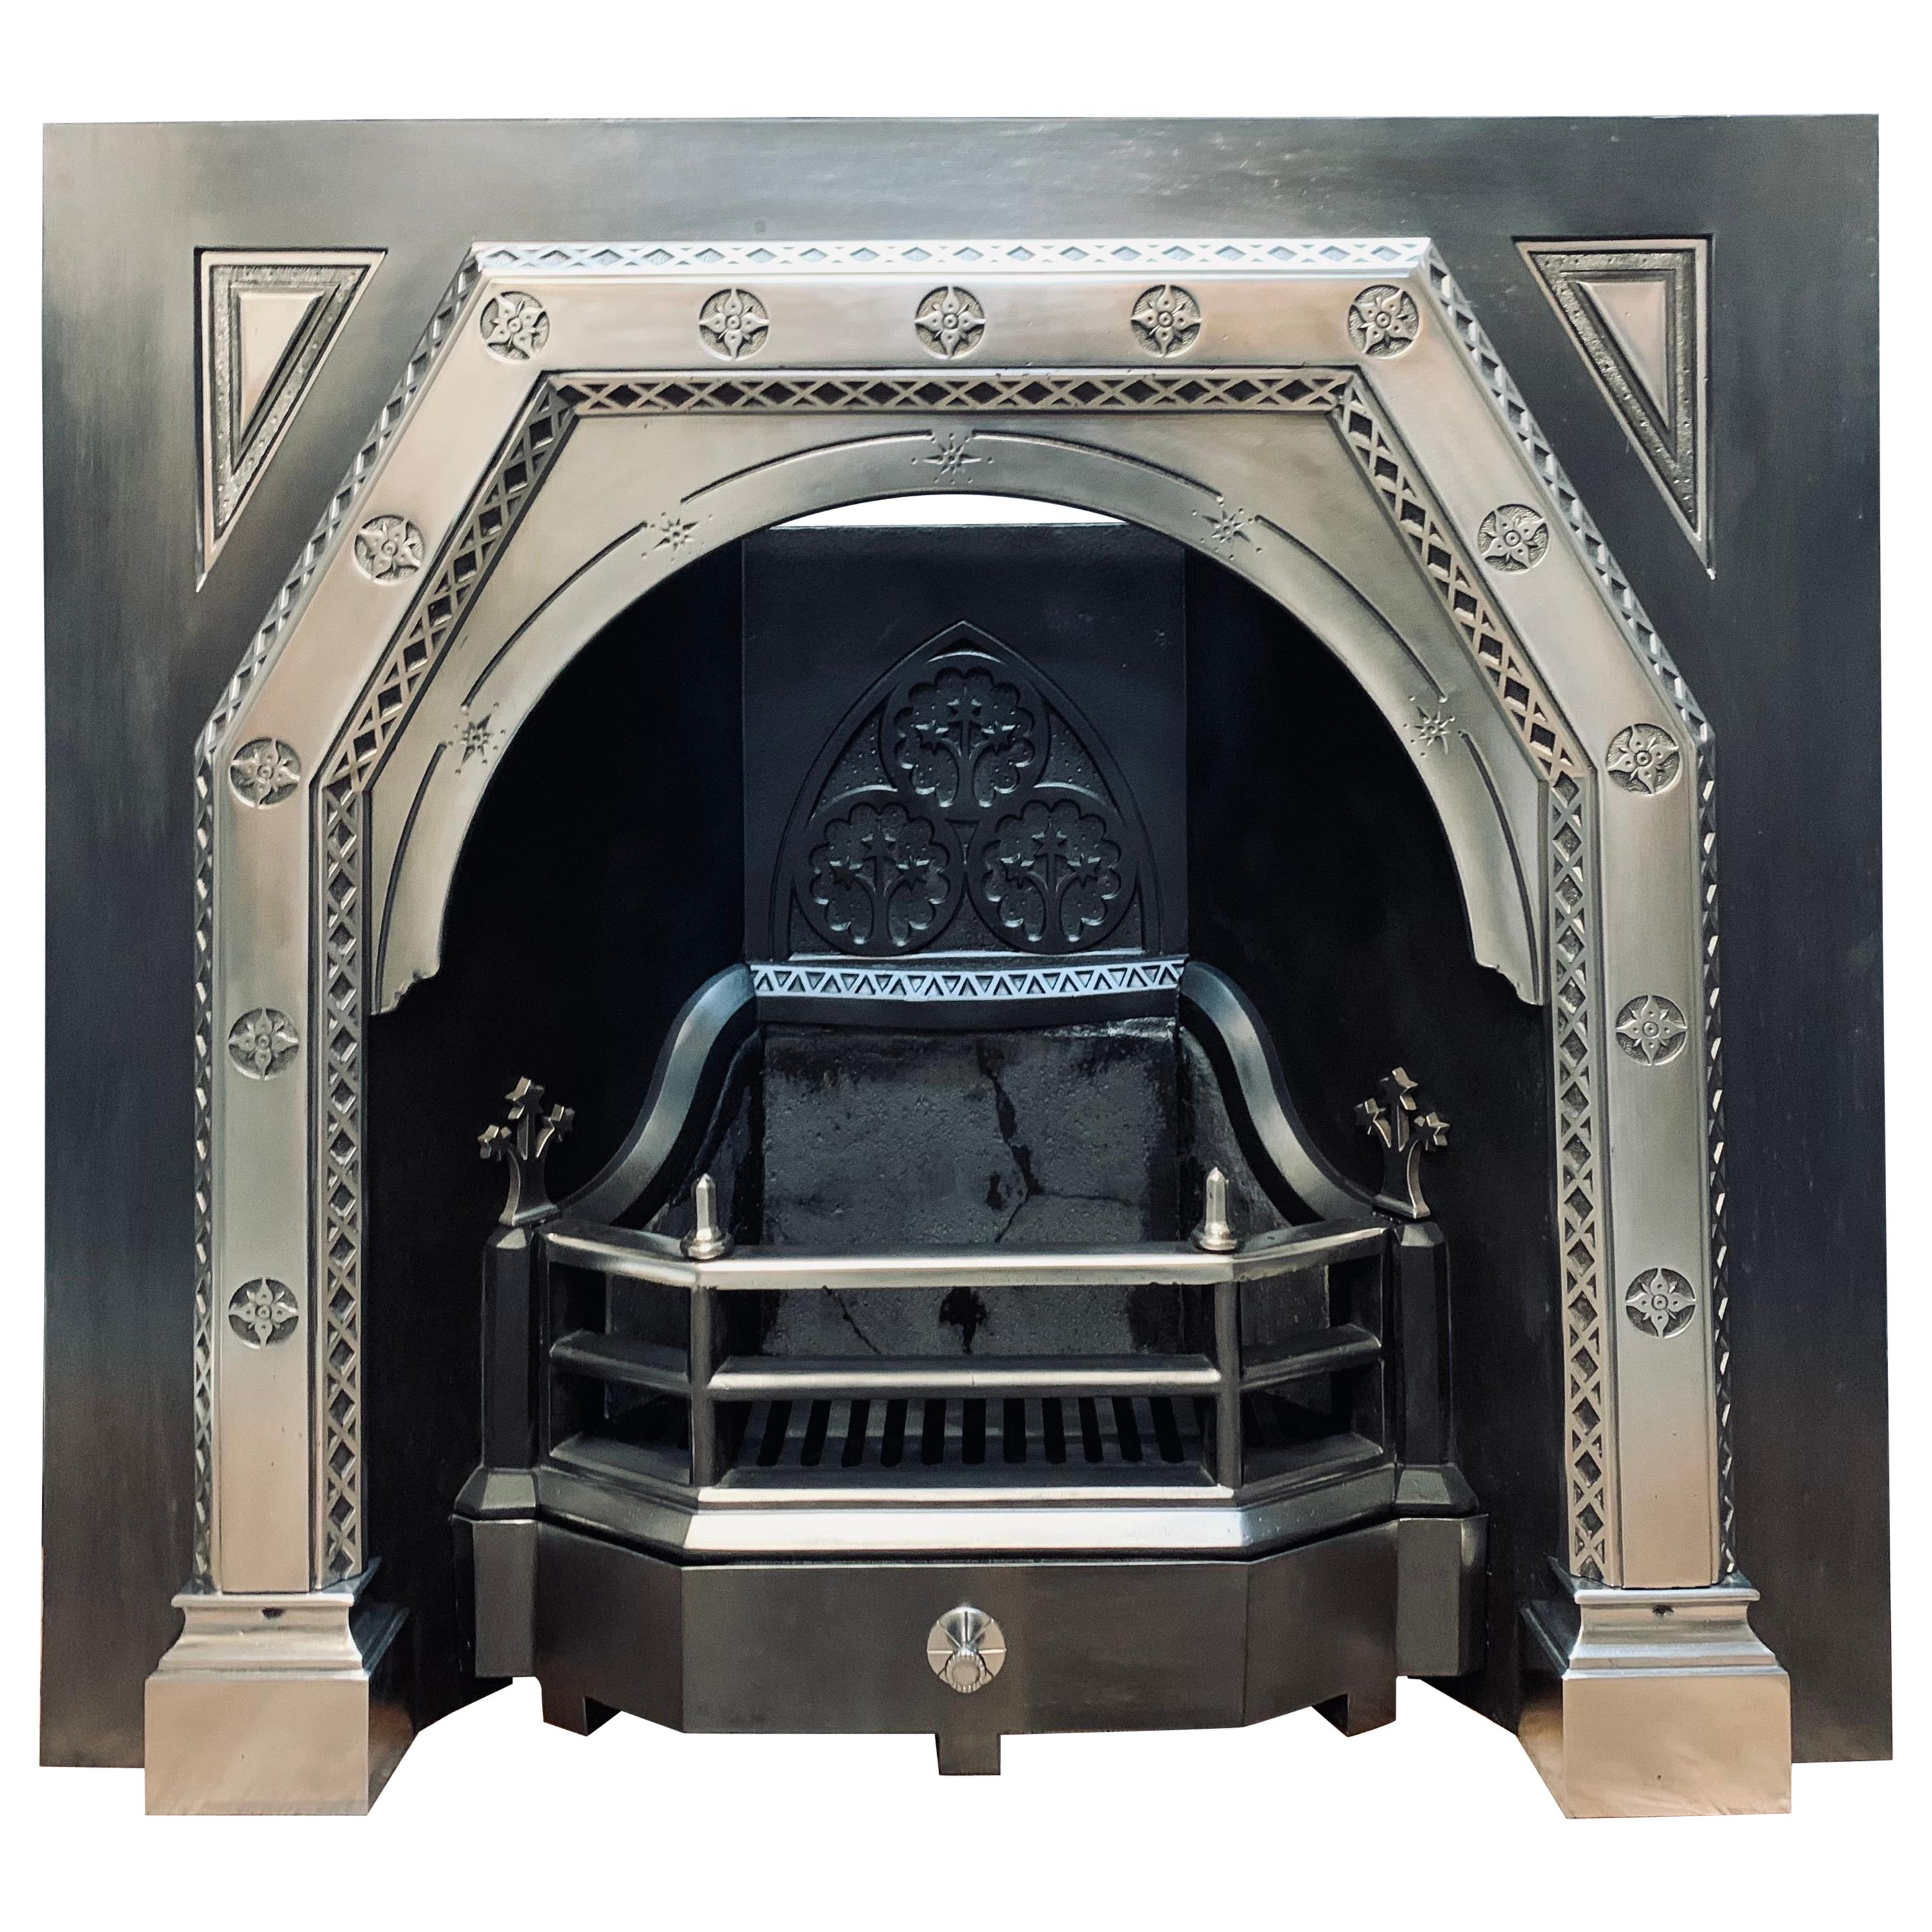 19th Century Scottish Aesthetic Movement Polished Cast Iron Fireplace Insert